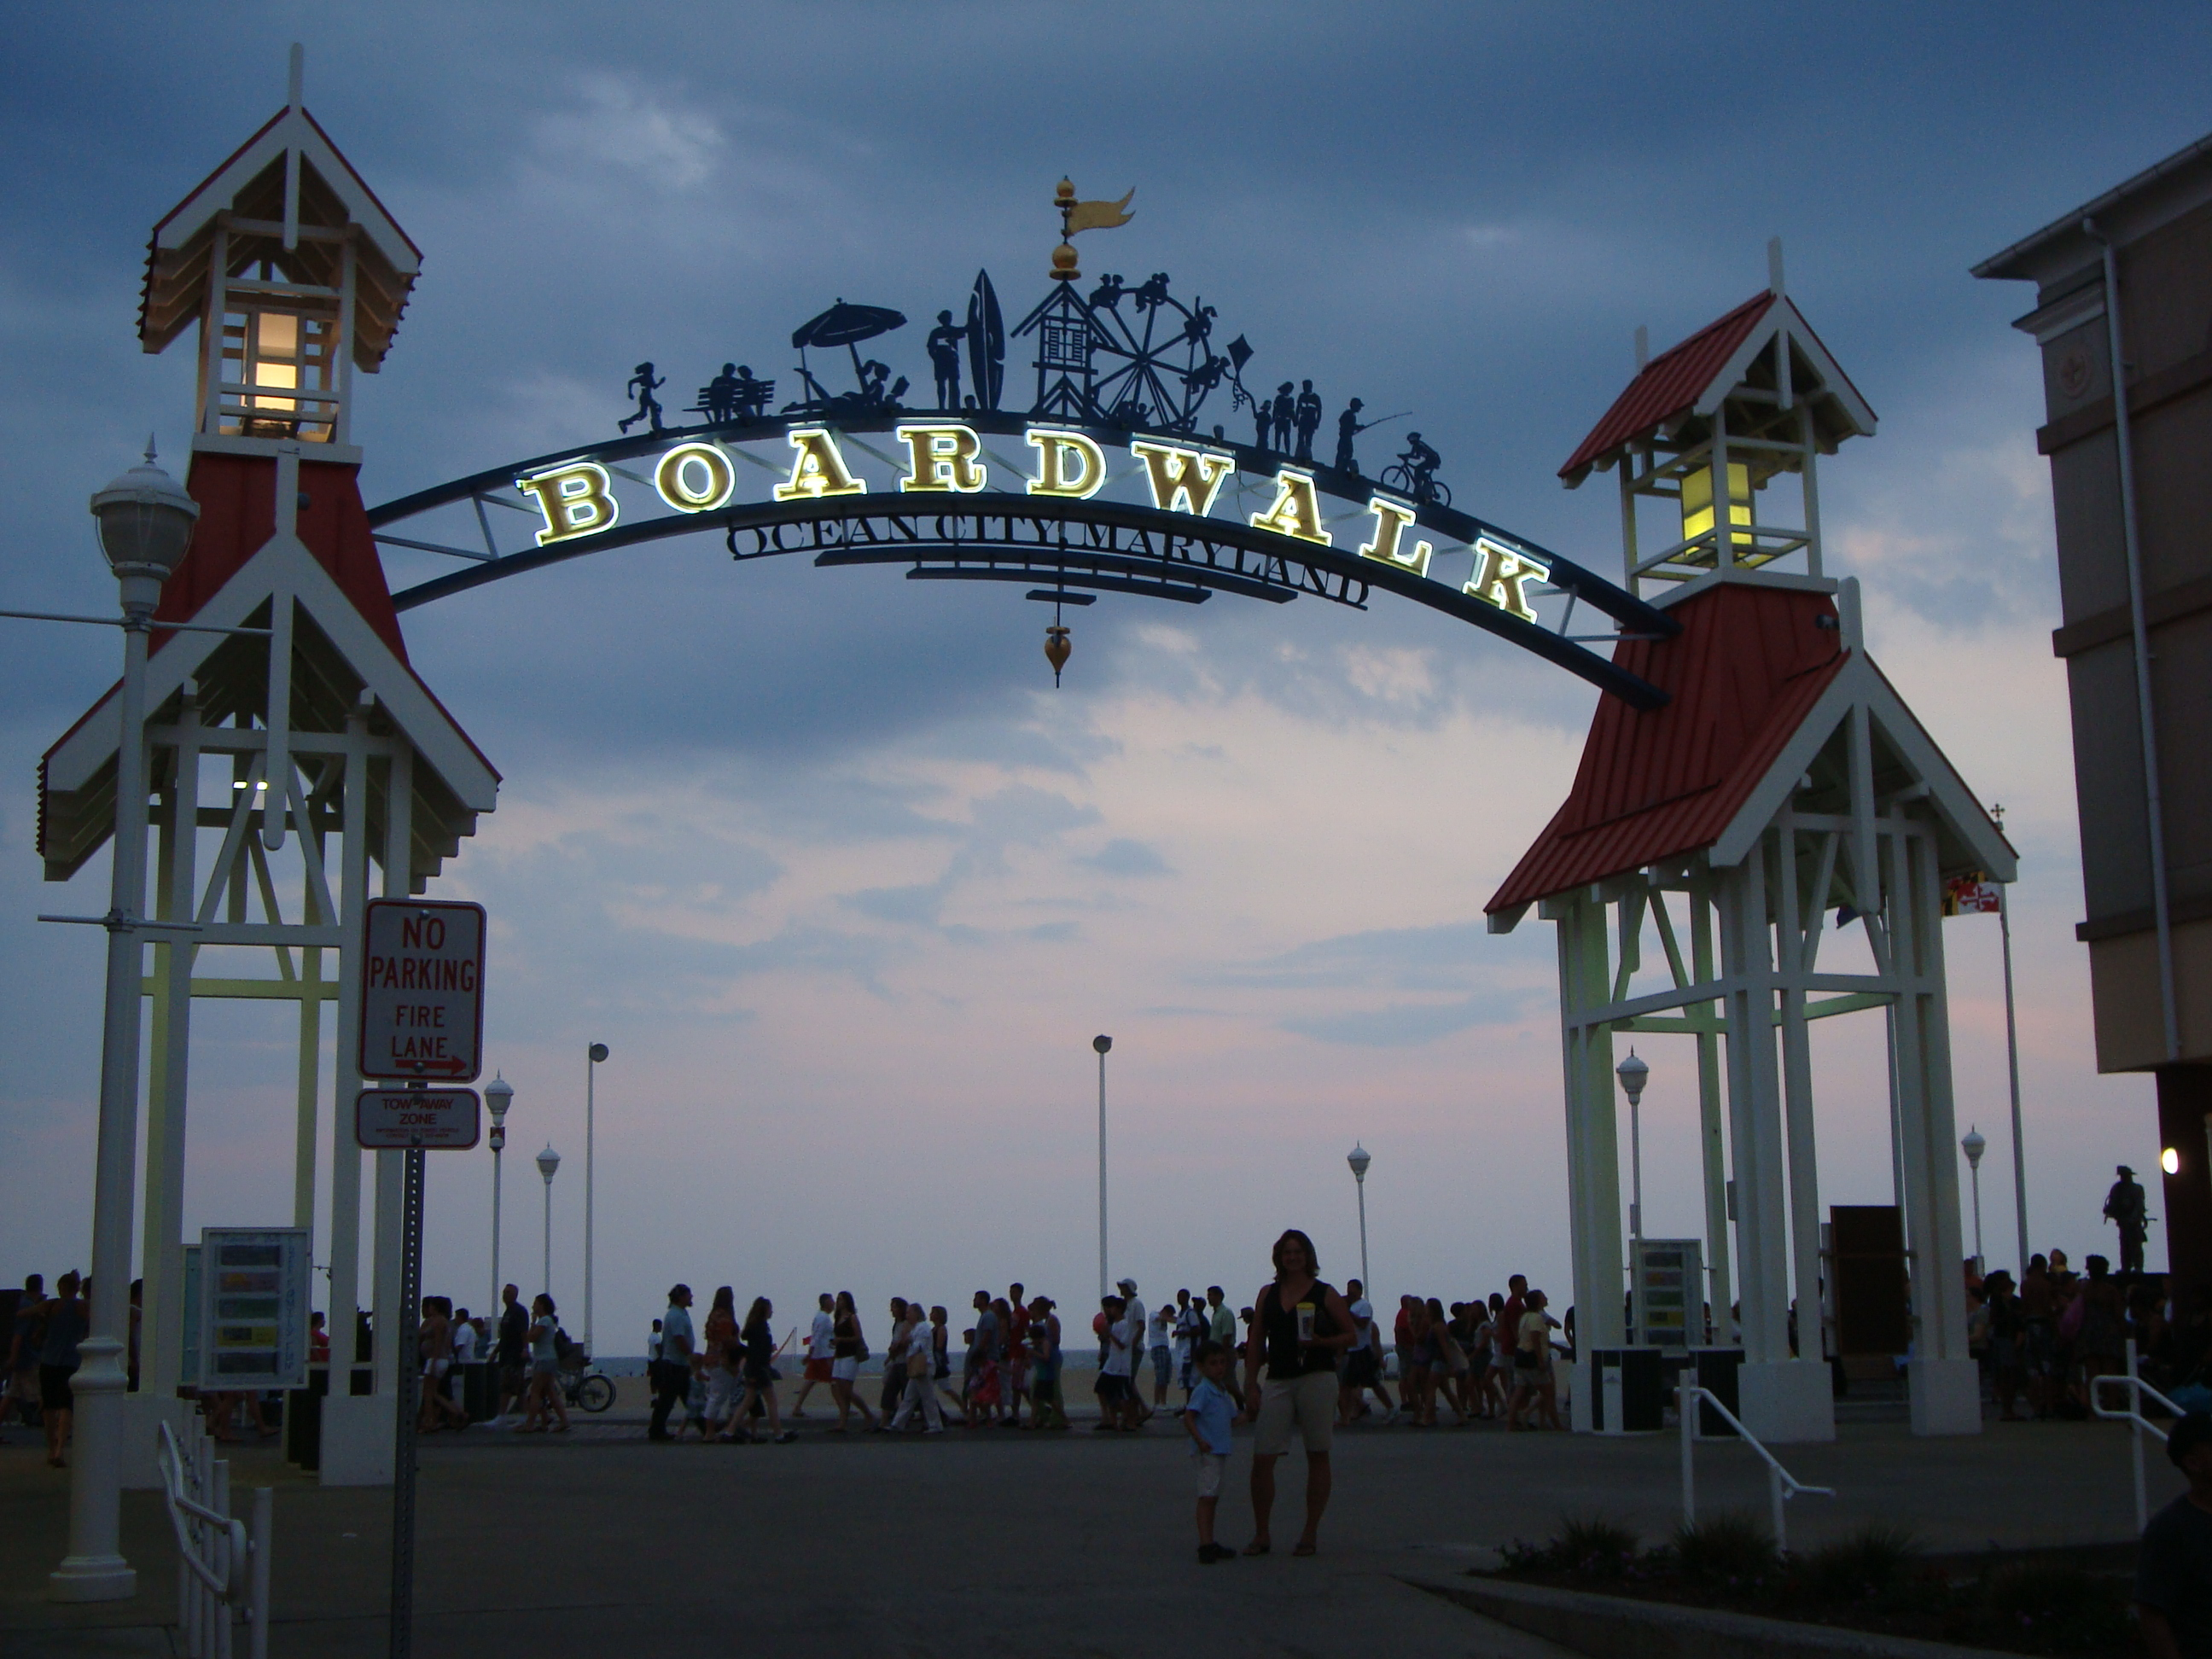 Boardwalk sign at Ocean City Maryland at dusk